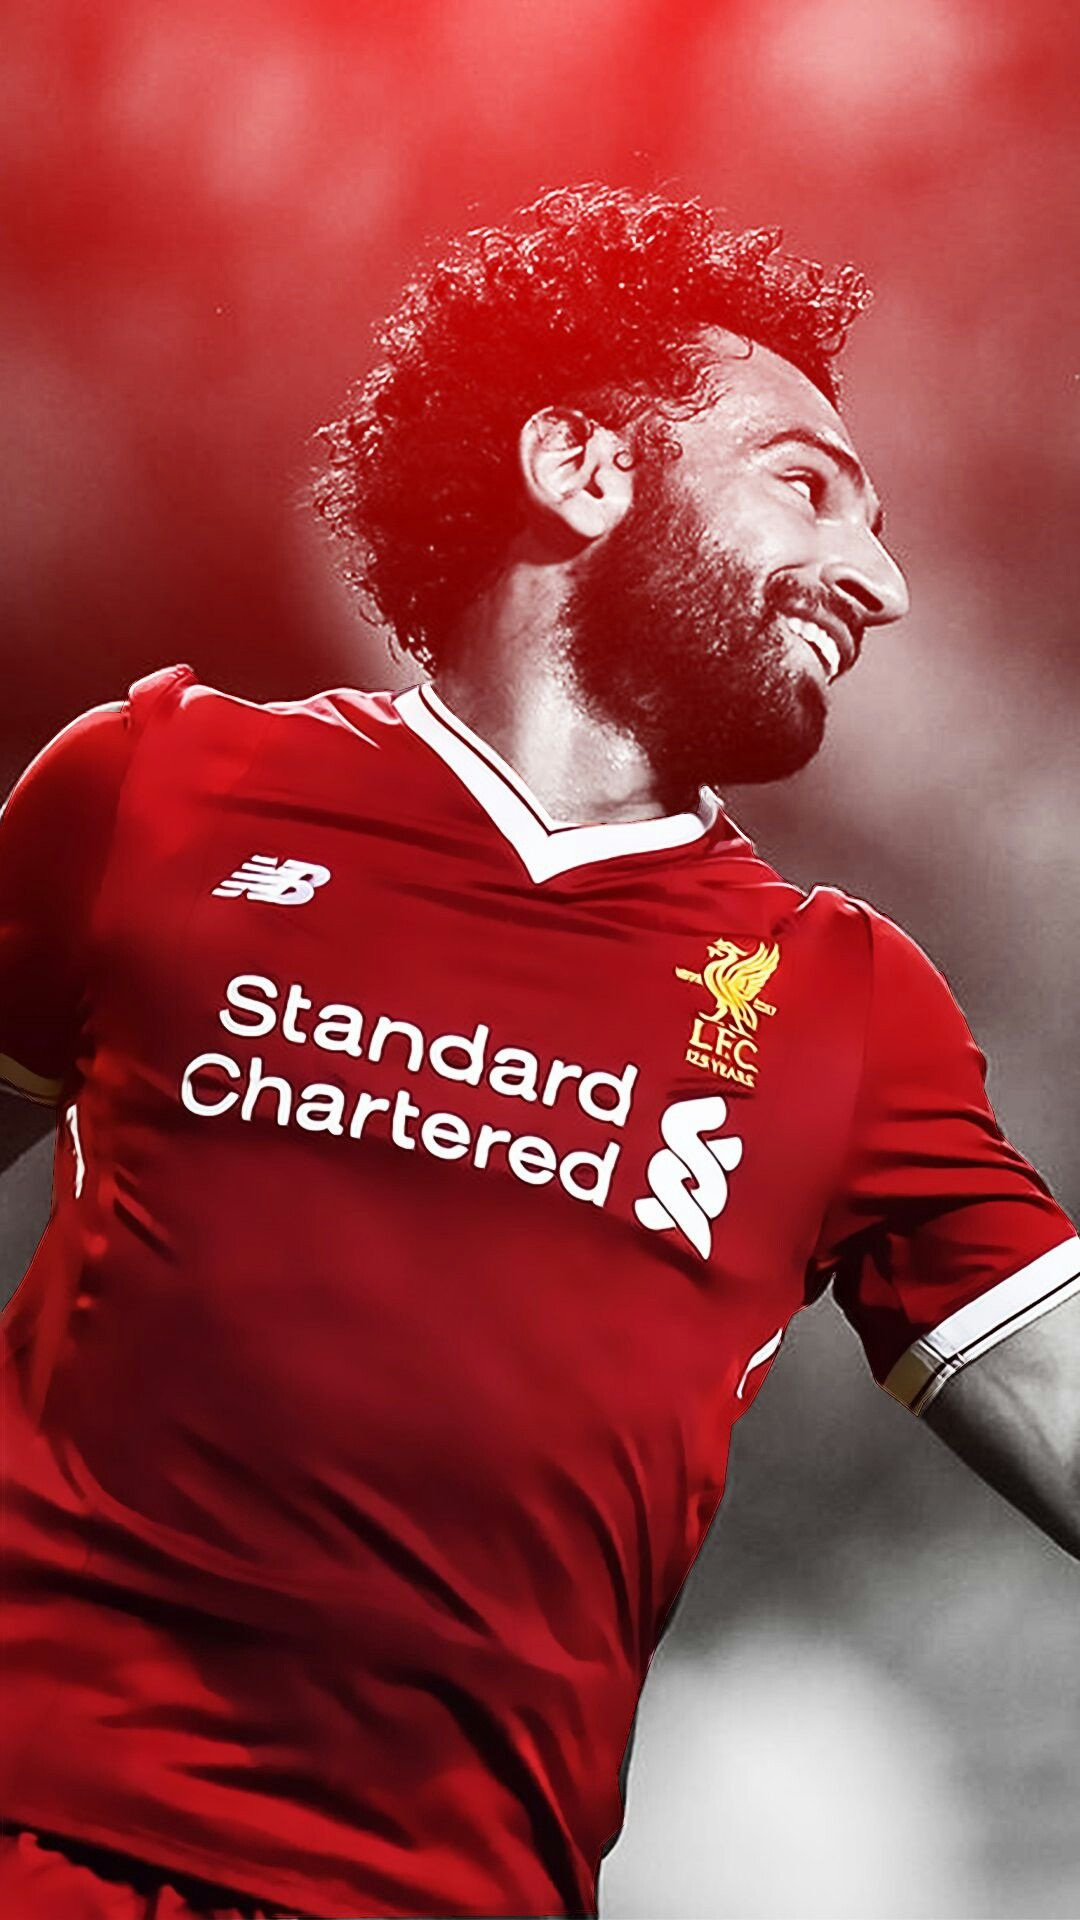 Pin by Mayar Sarg on Mohamad Salah | Pinterest | Salah liverpool, Mohamed salah and Liverpool ...